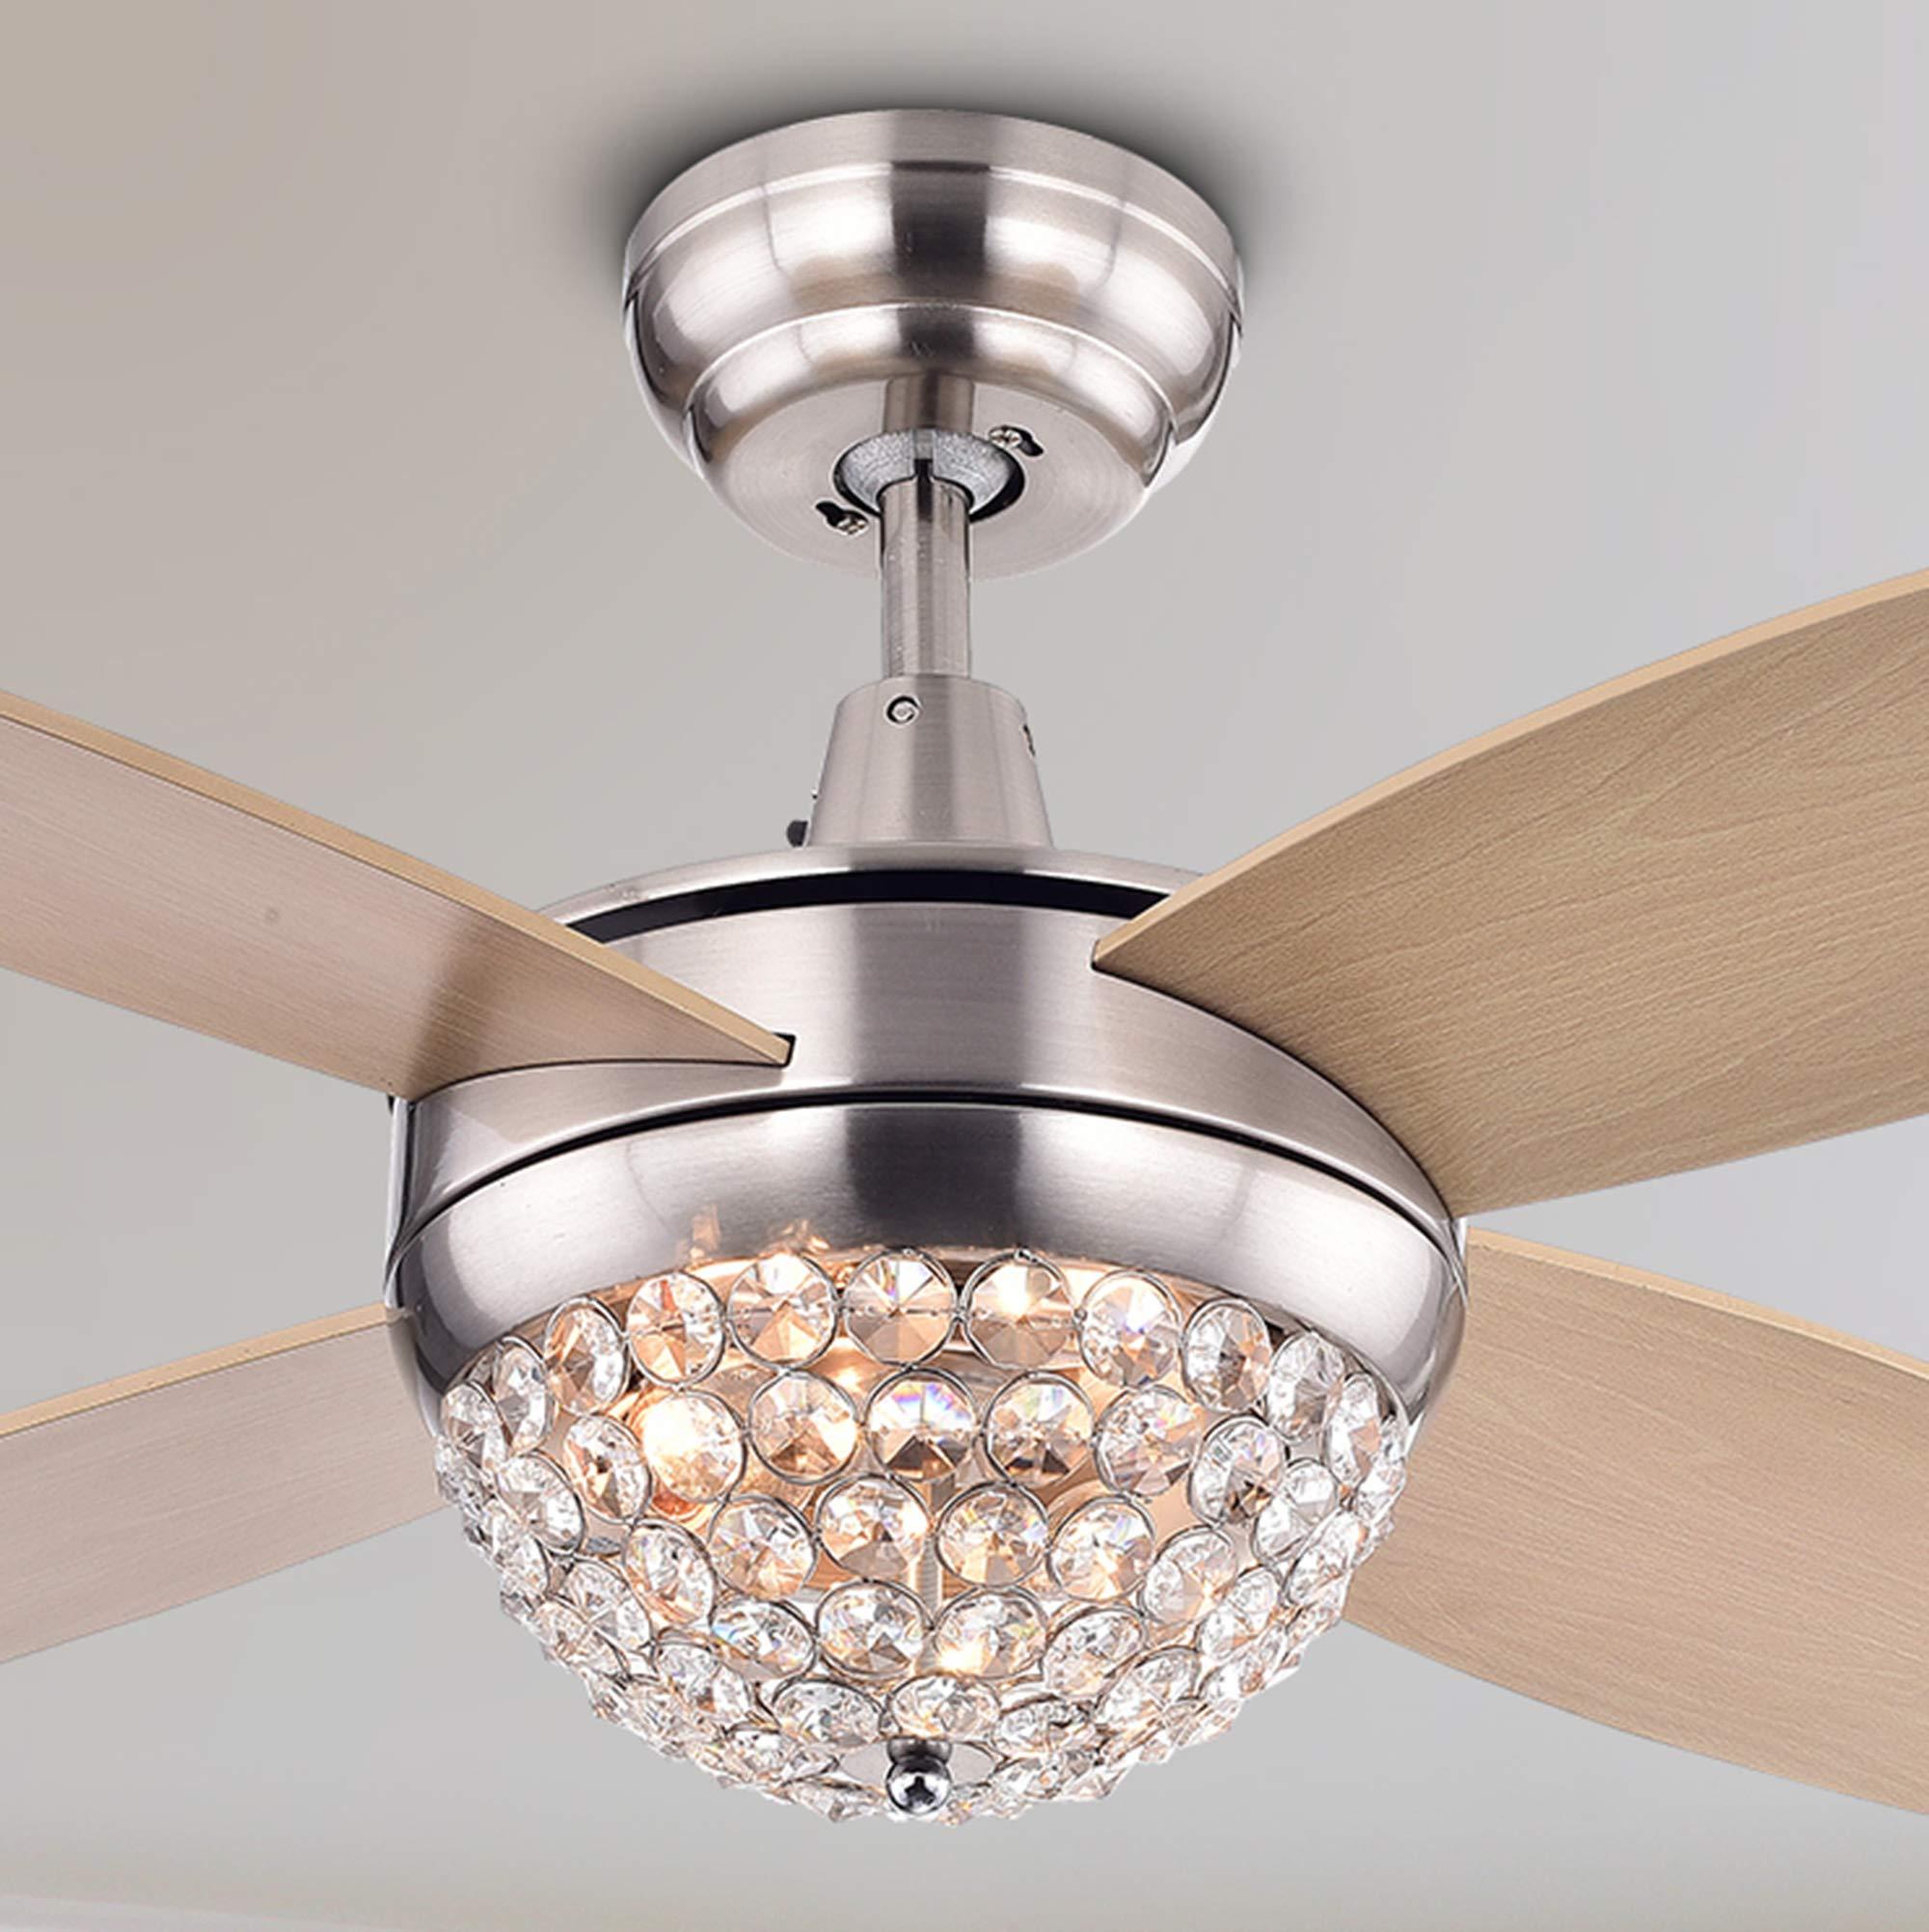 Warehouse of Tiffany CFL-8171TIX Leandra Wood Nickel 2-Light 4-Blade Crystal 46-inch Remote Ceiling Fan, Beige